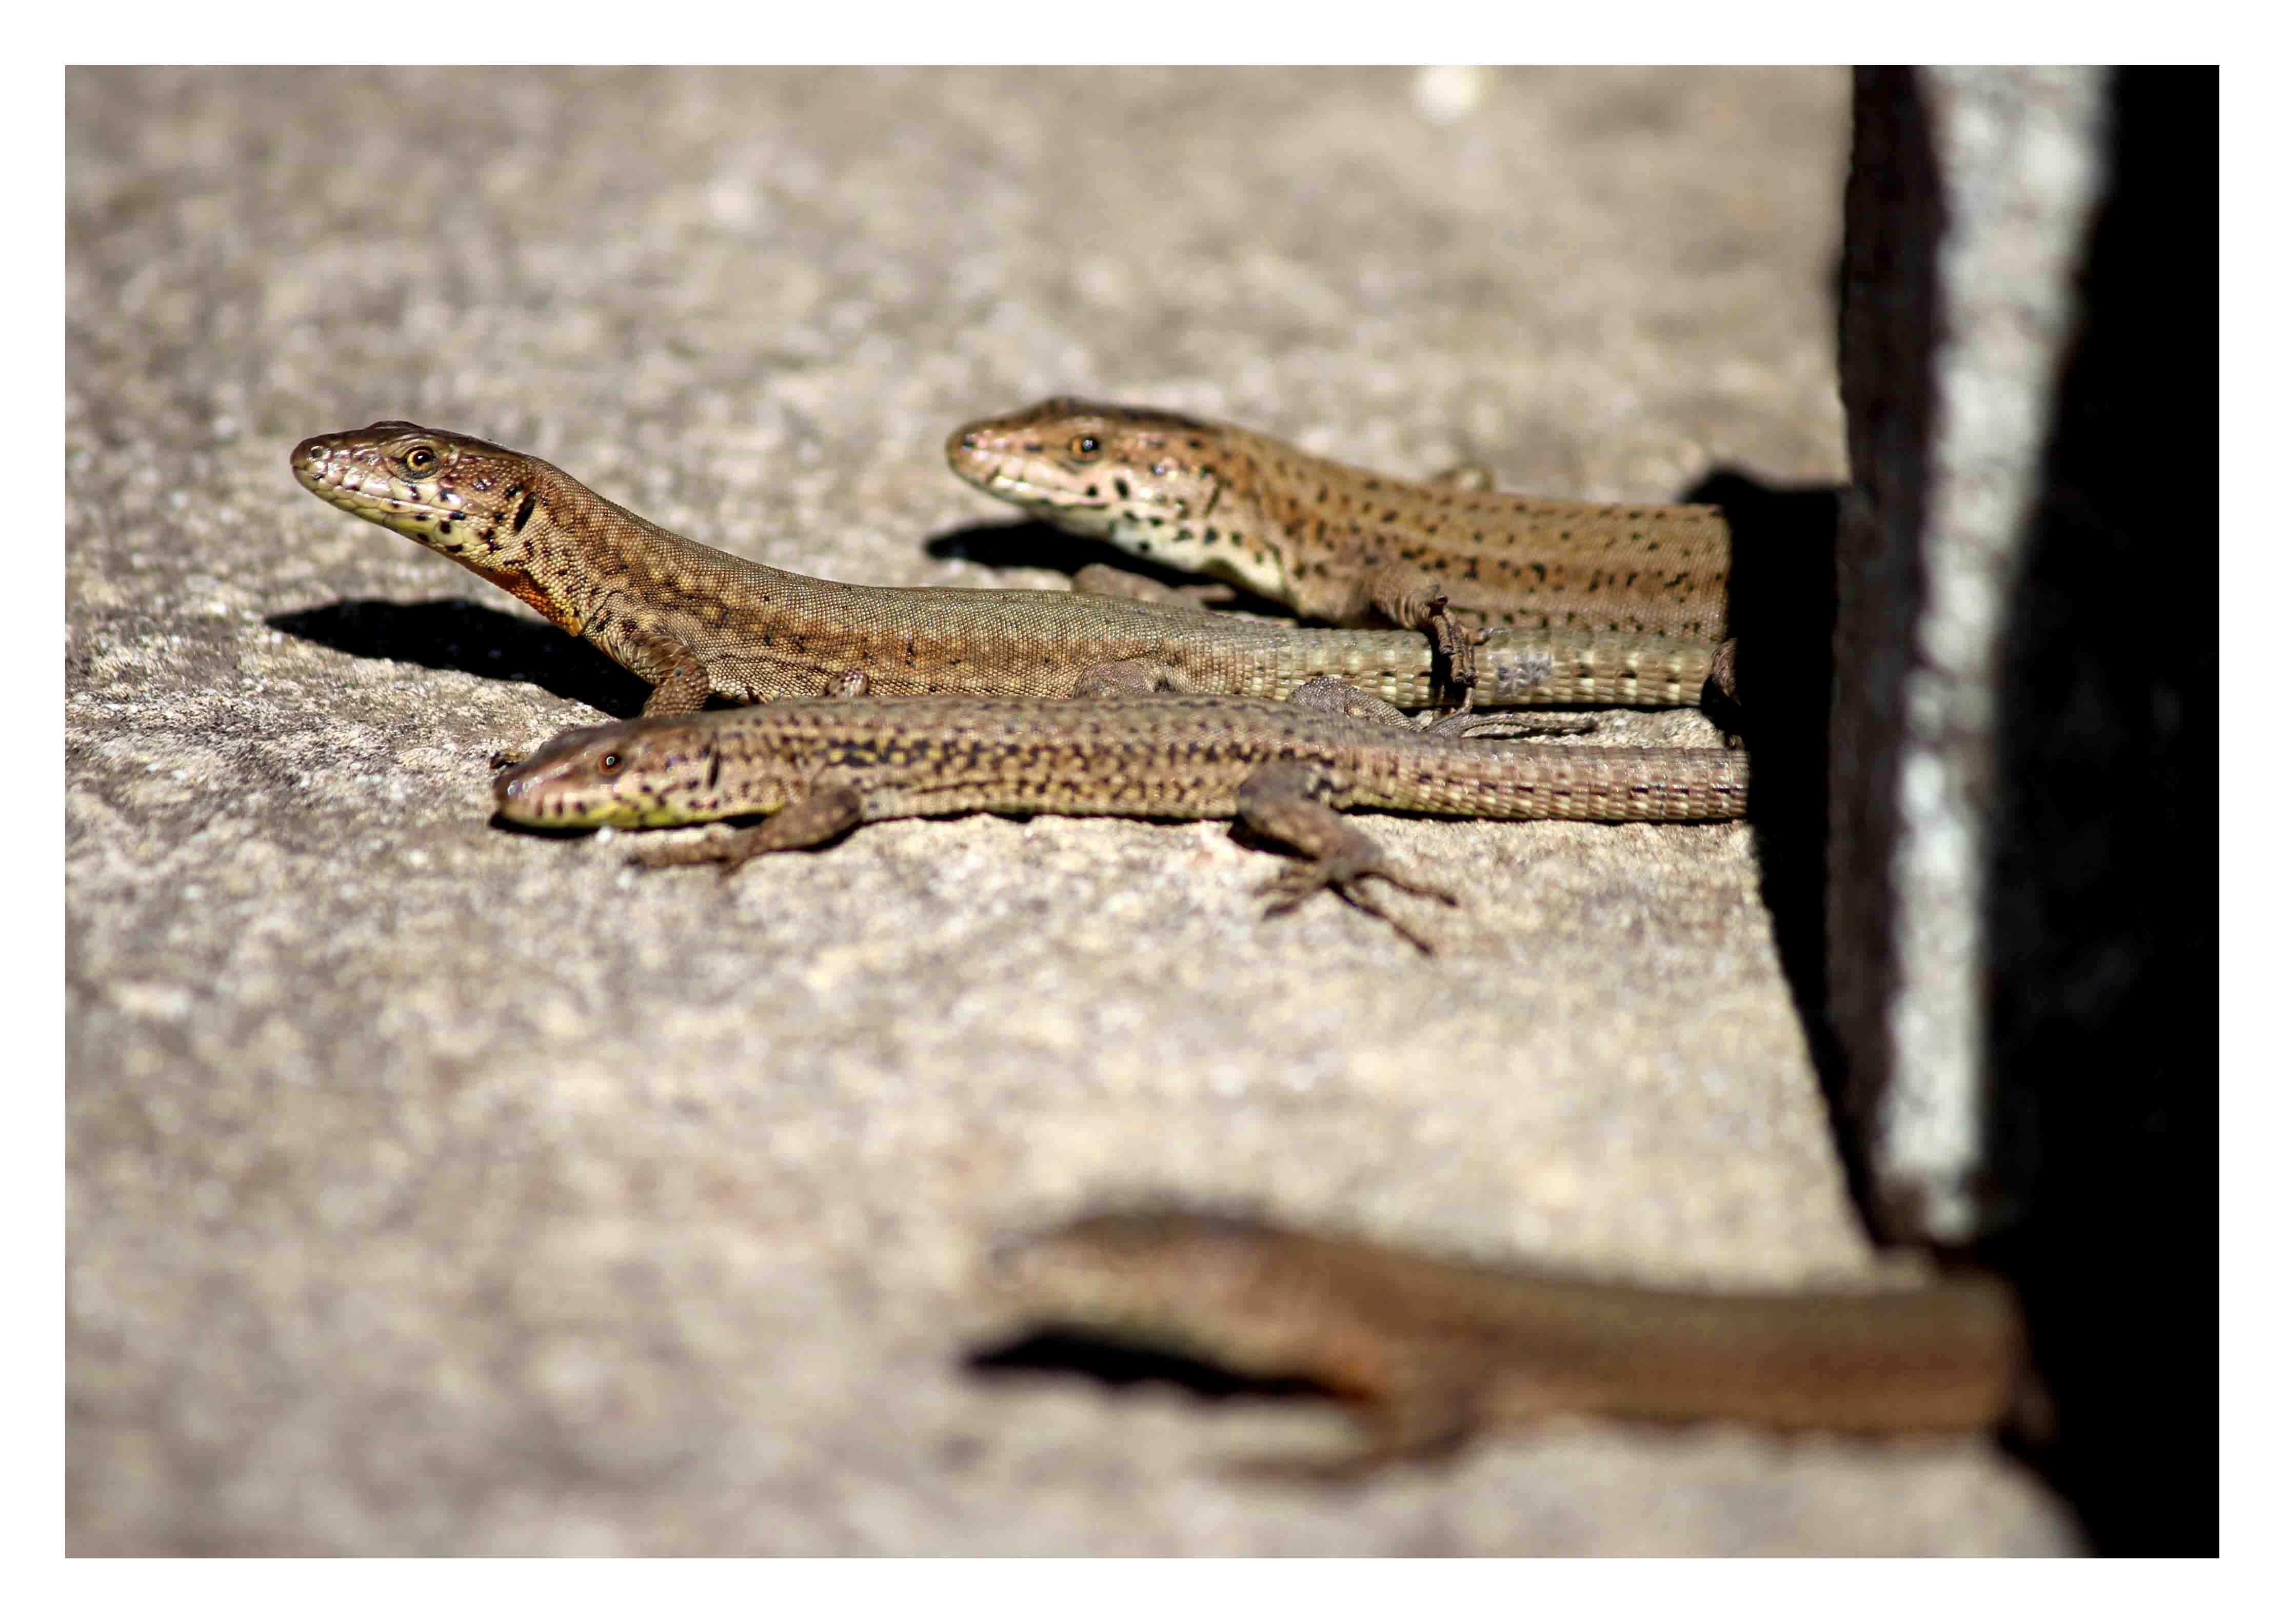 ON?  :))  ['Dos dragons de Komodo s'aparellen al Zoo de Barcelona' (http://www.youtube.com/watch?v=xxPjfSNqhxg)]